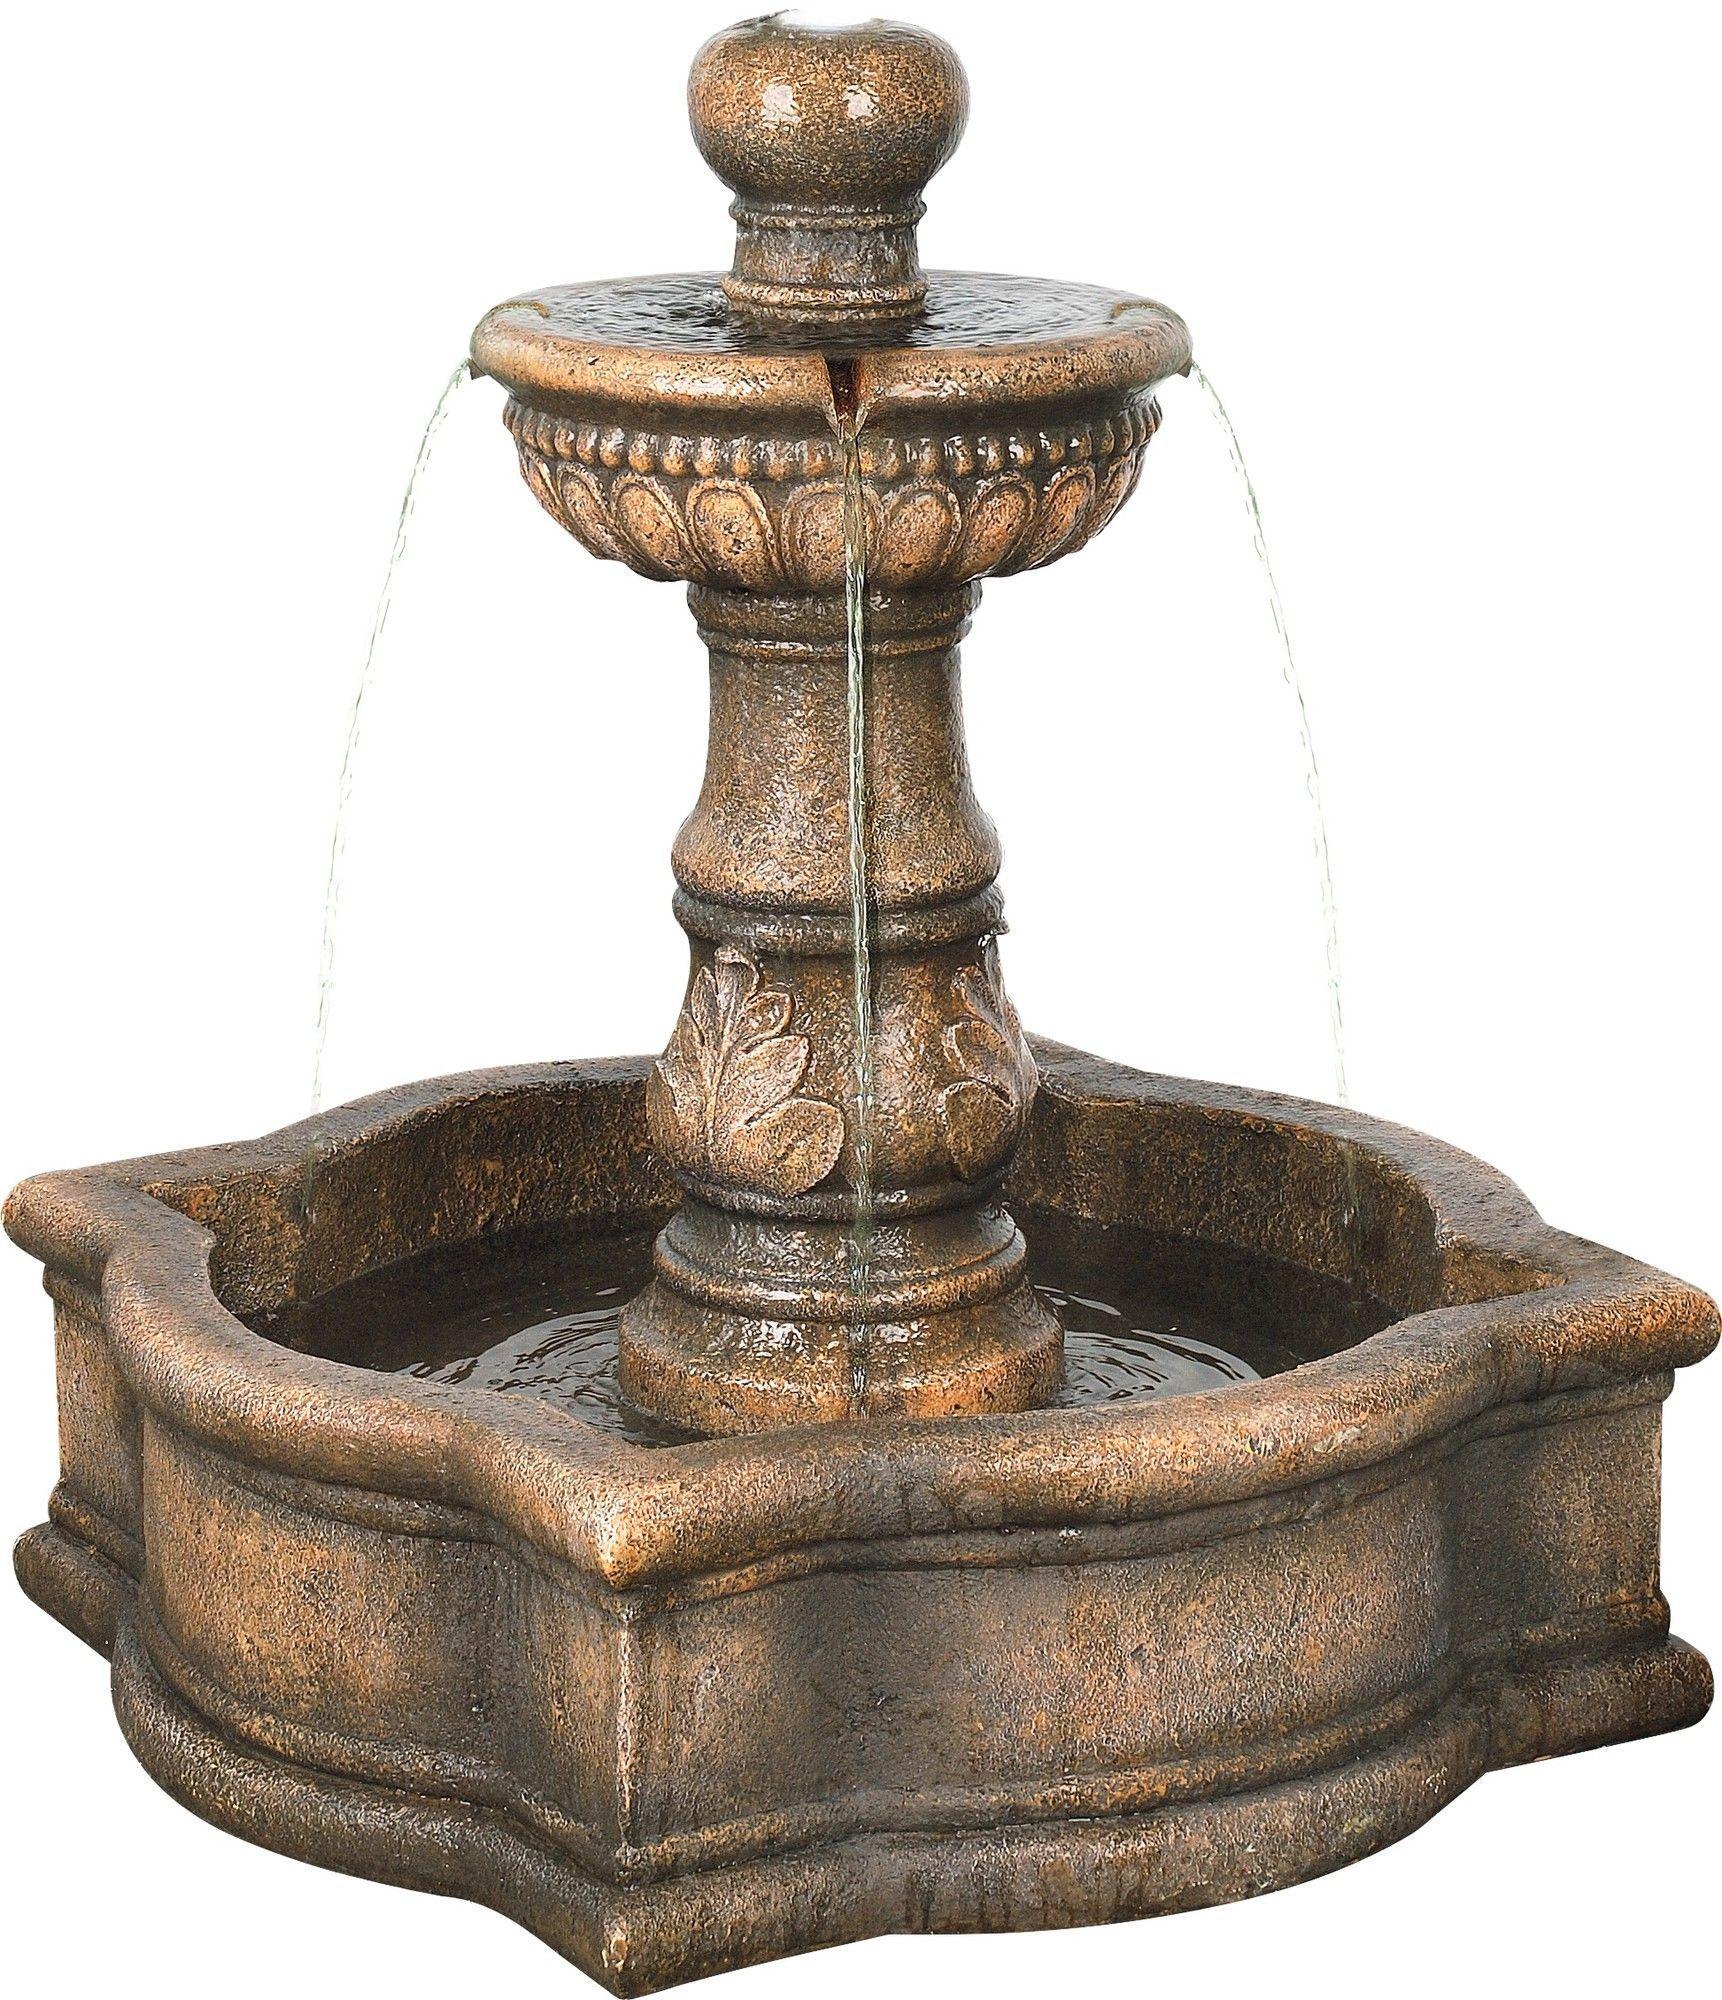 Pembrooke Old World Design Fountain